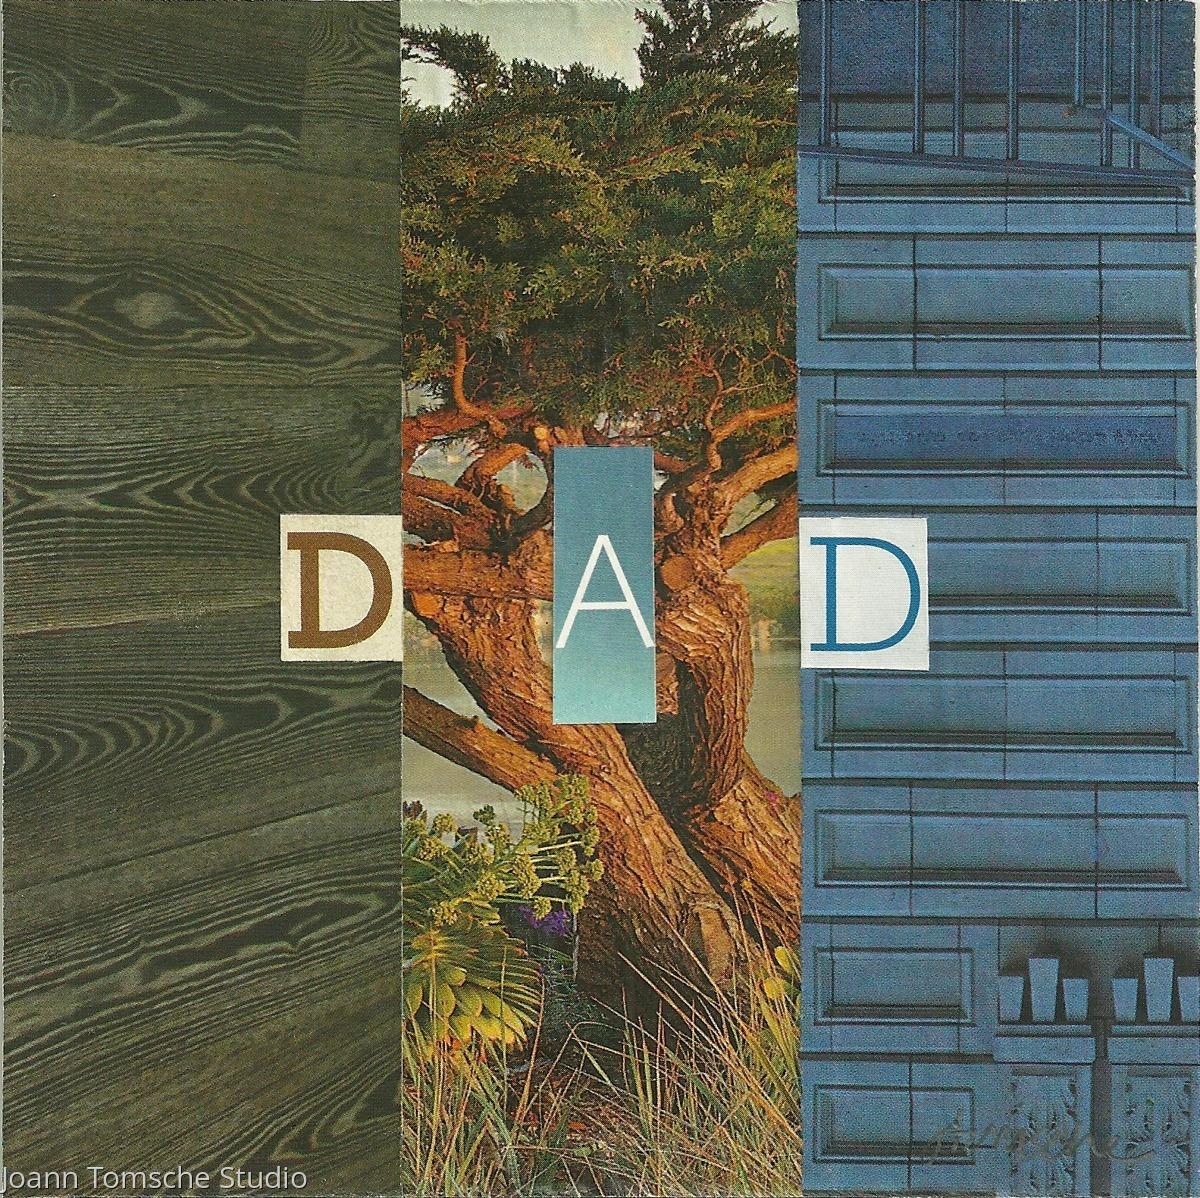 Dad art tile (large view)